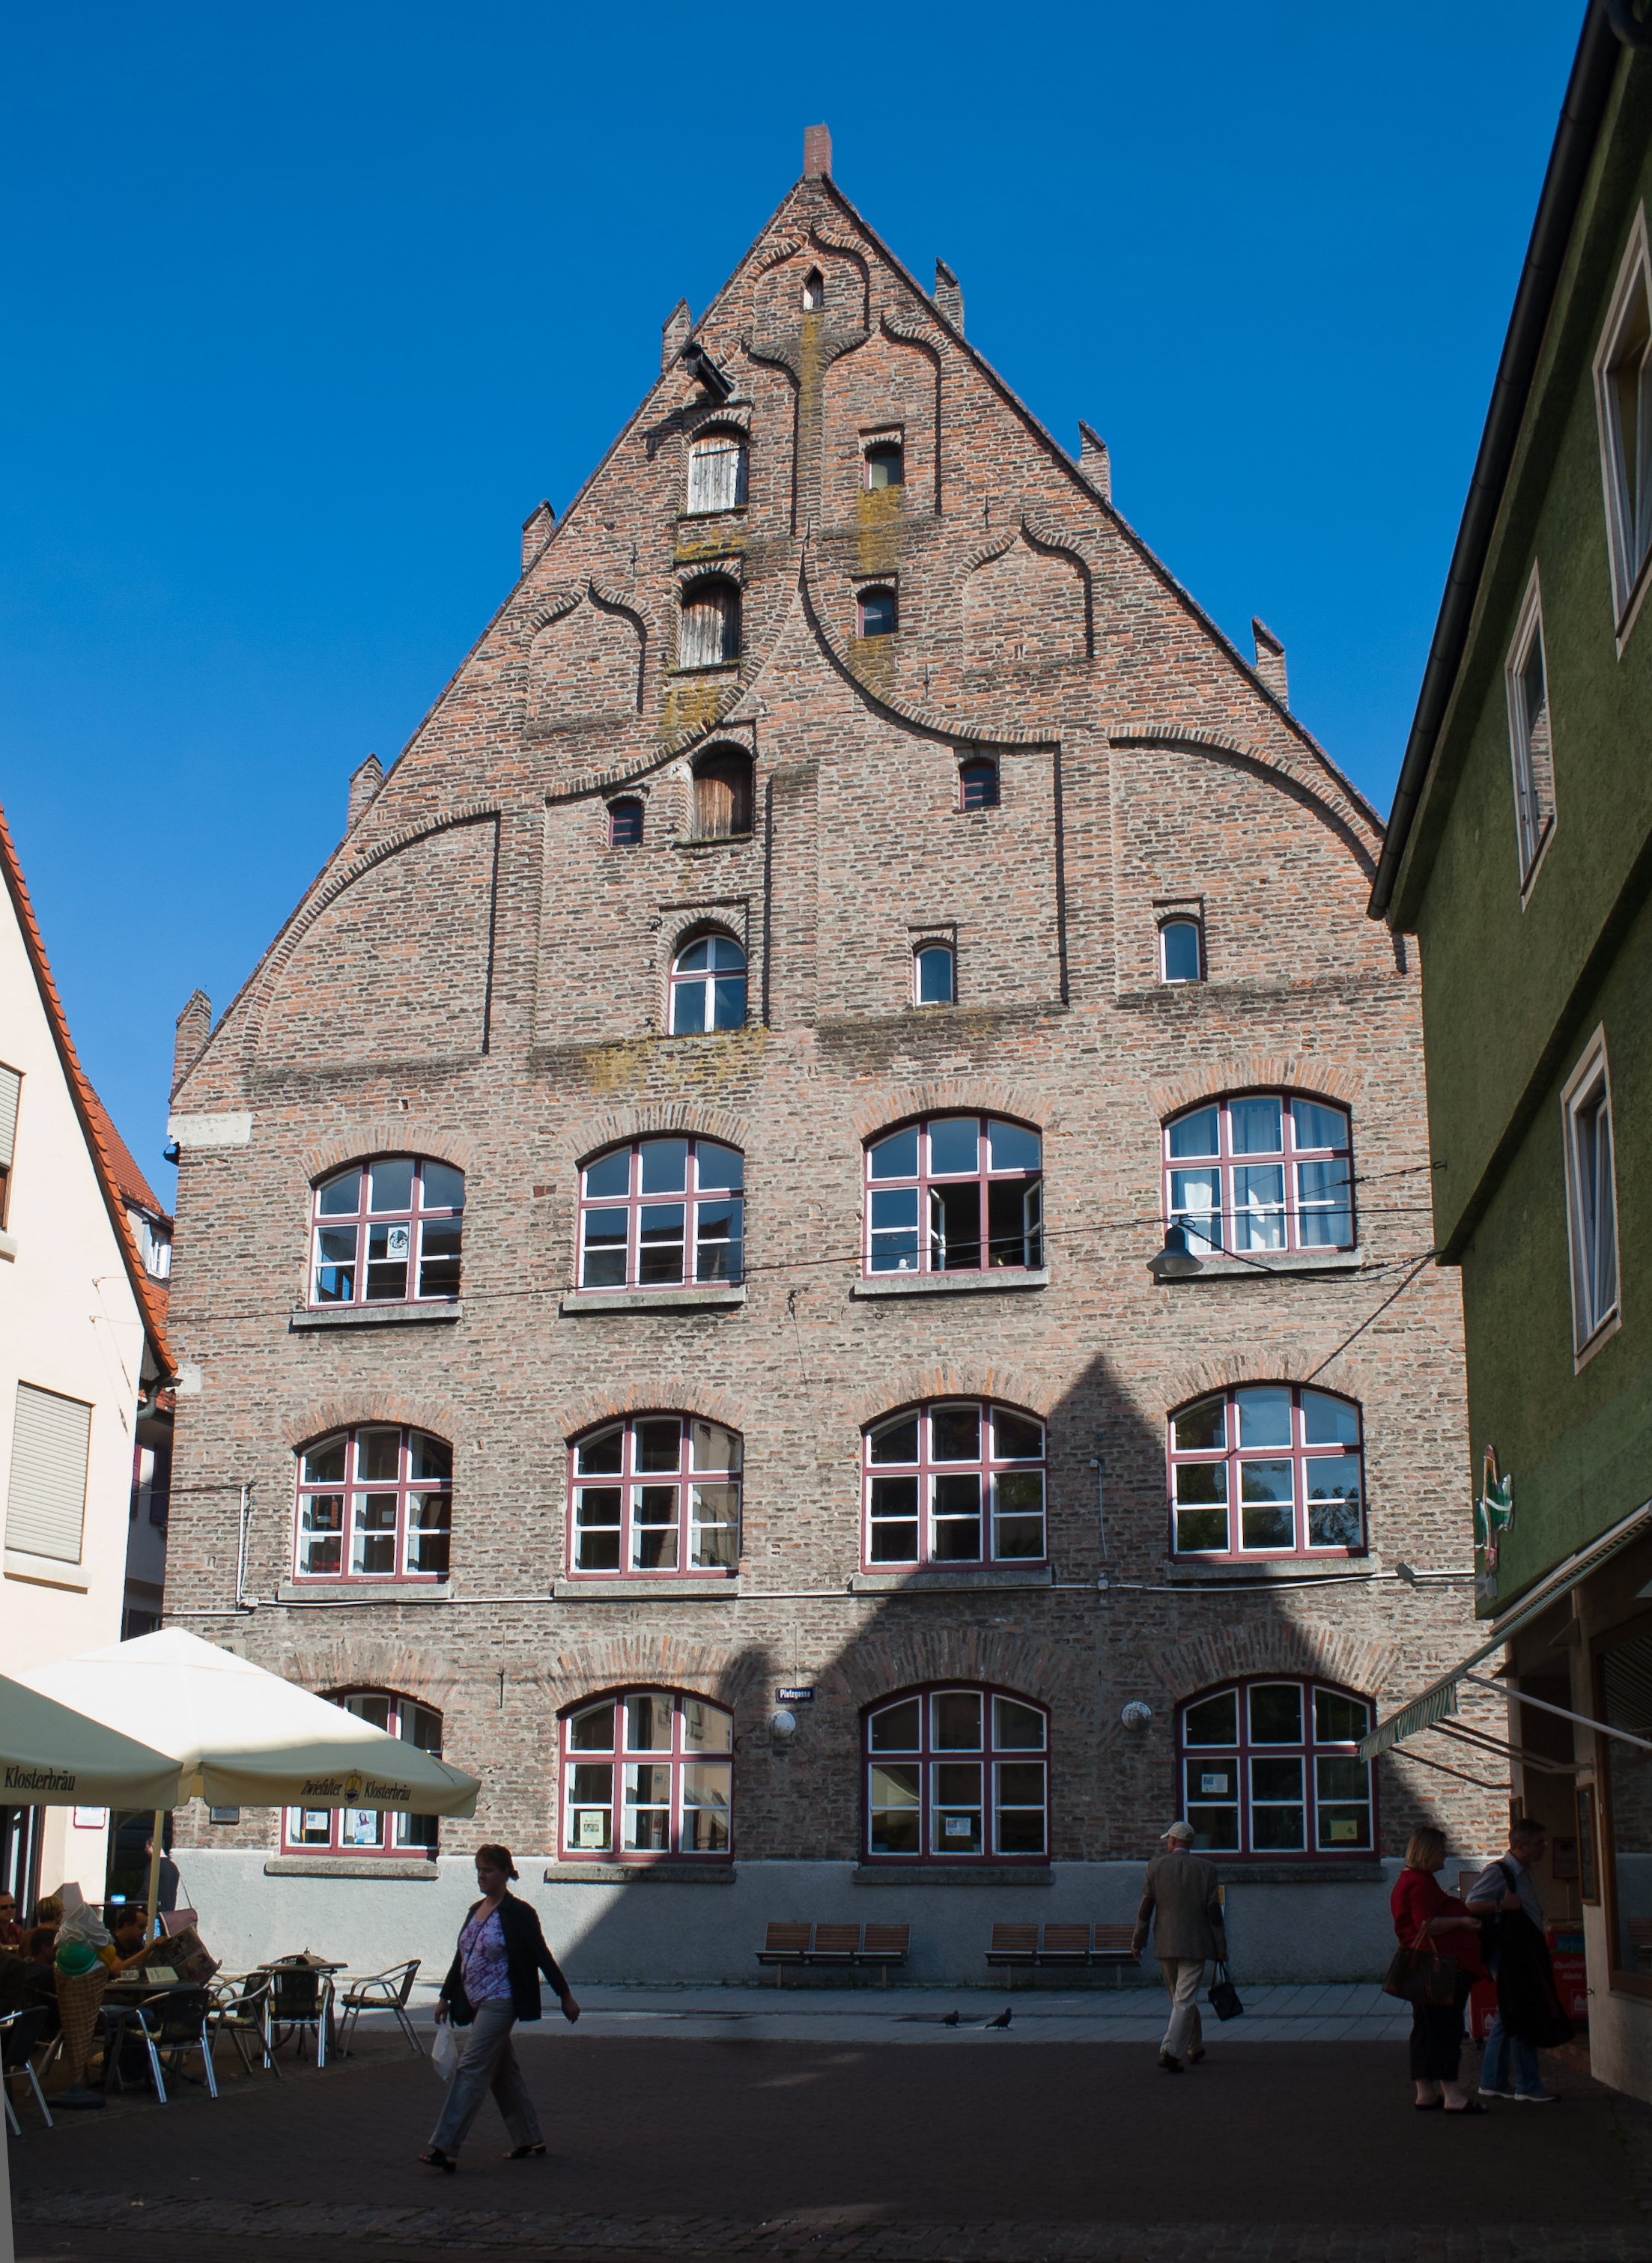 Ulm_Platzgasse_18_B%C3%BCchsenstadel_2011_09_15.jpg